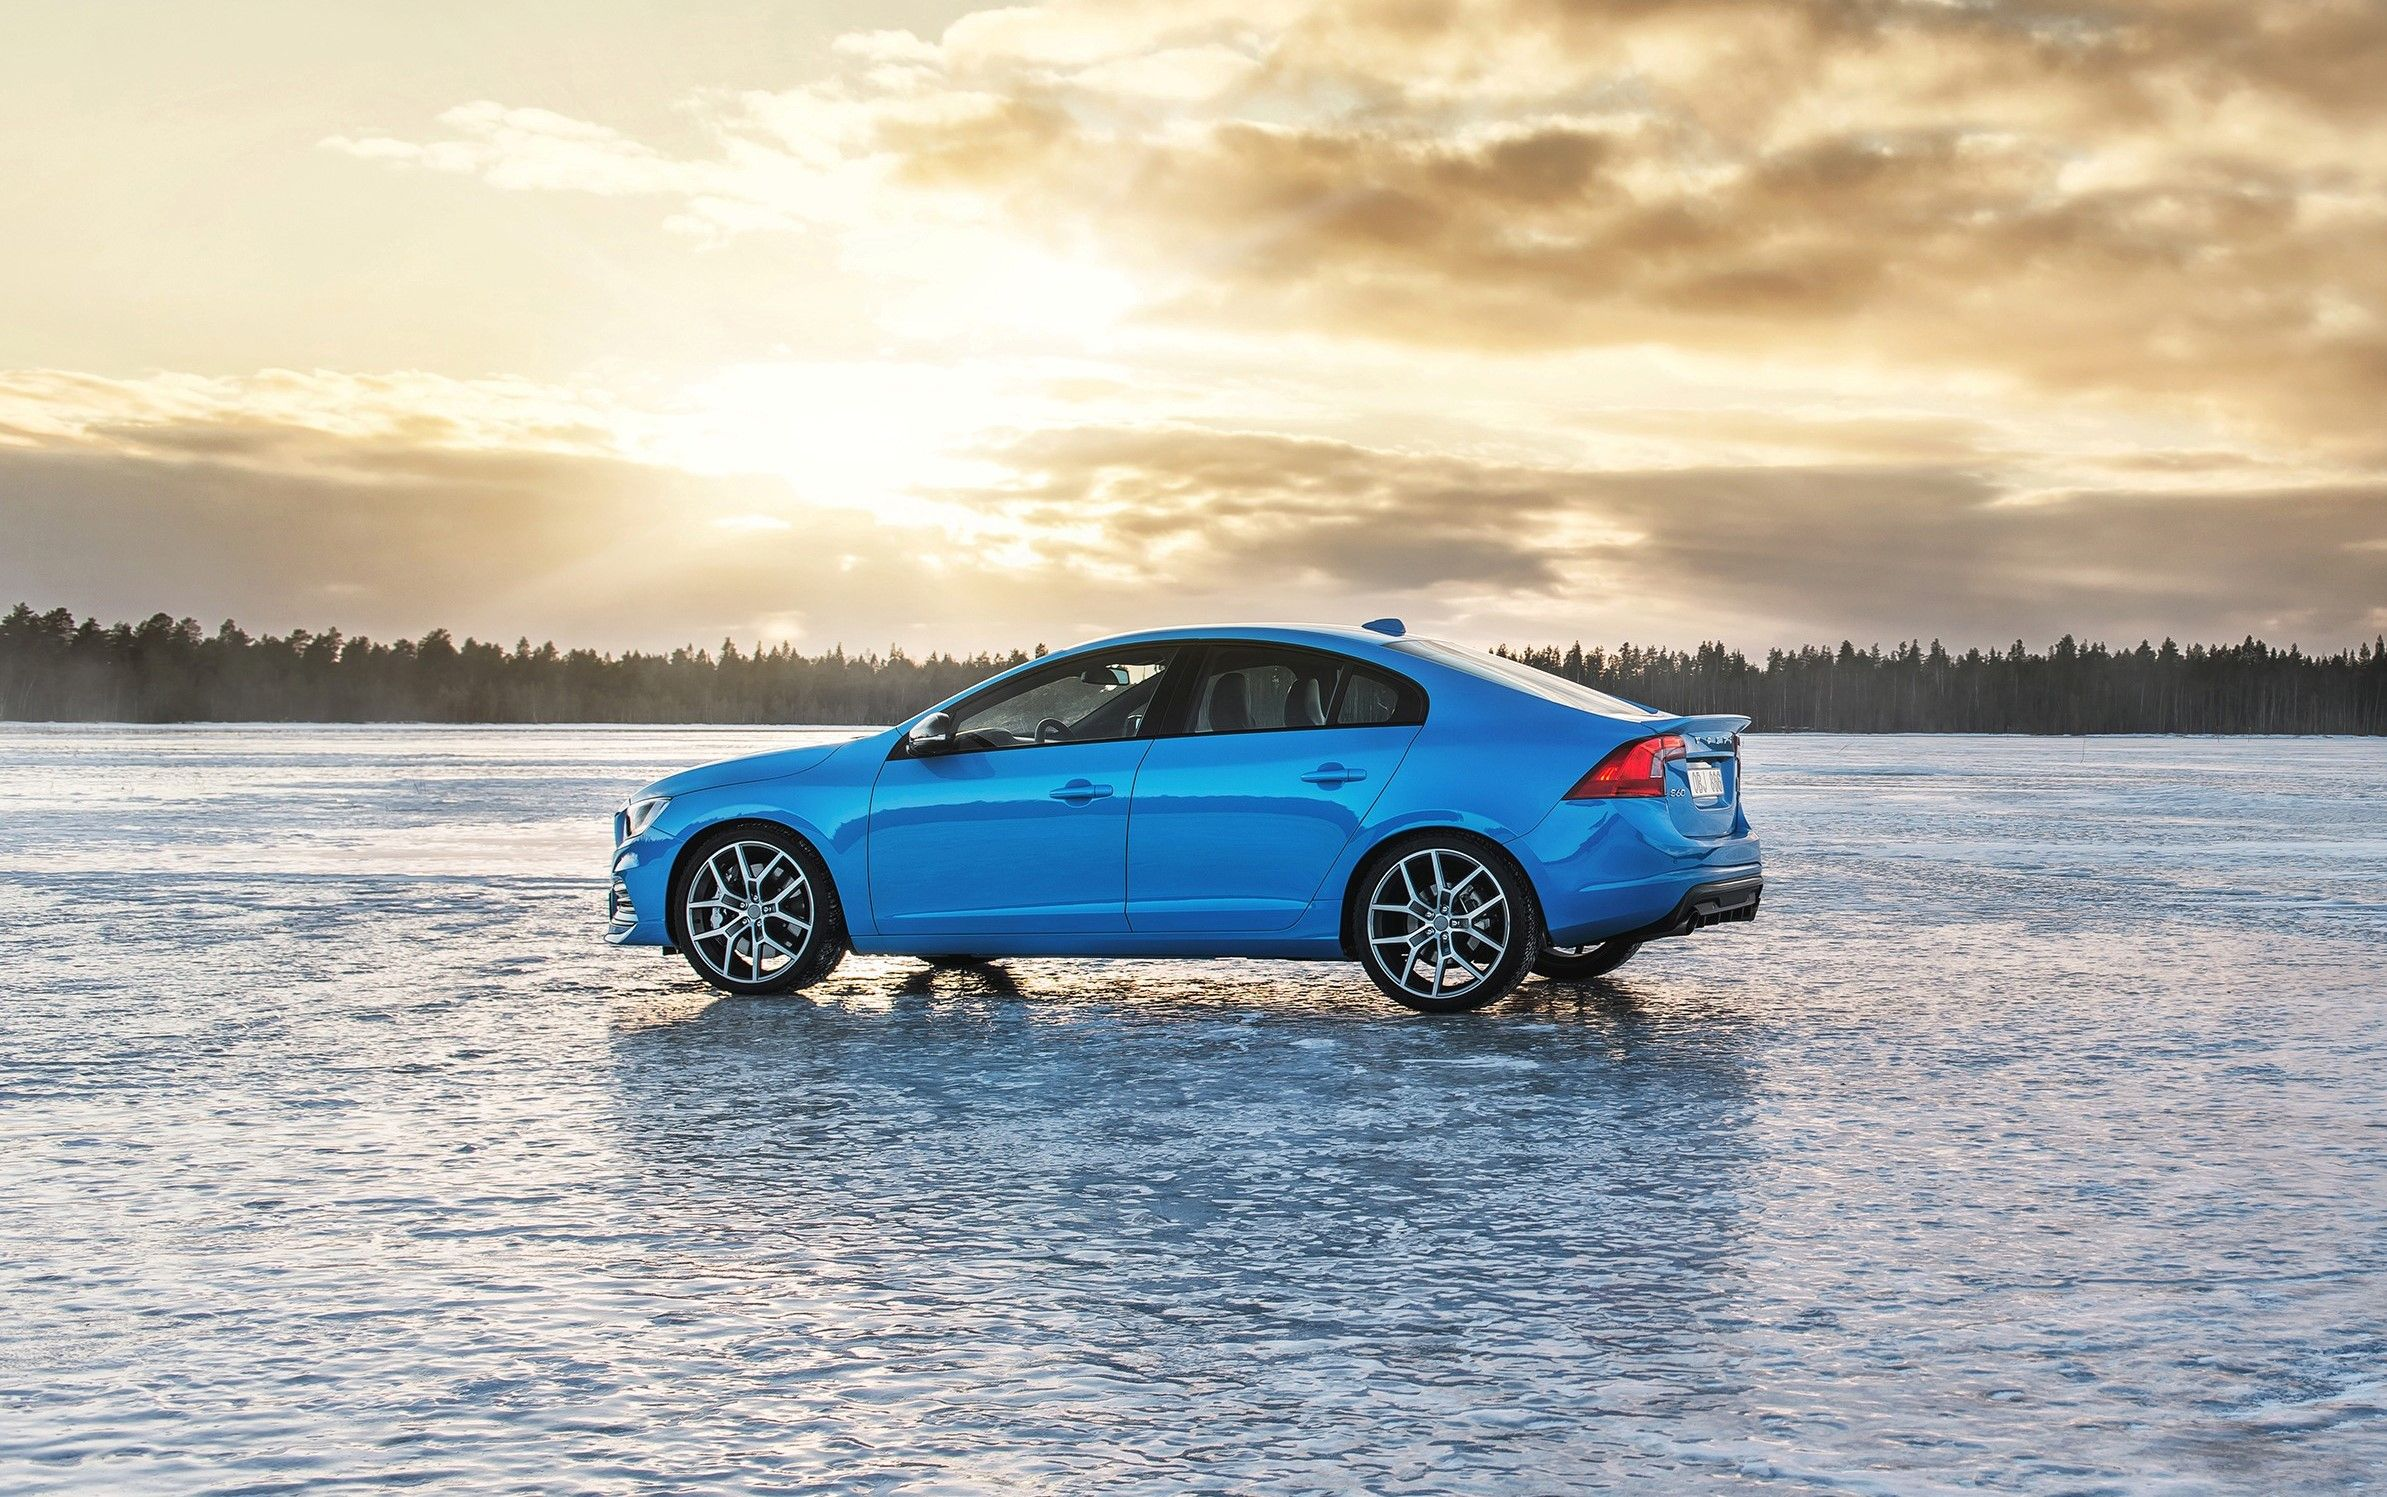 Volvo Buys High Performance Car Company Polestar Performance Motrface High Performance Cars Performance Cars Volvo